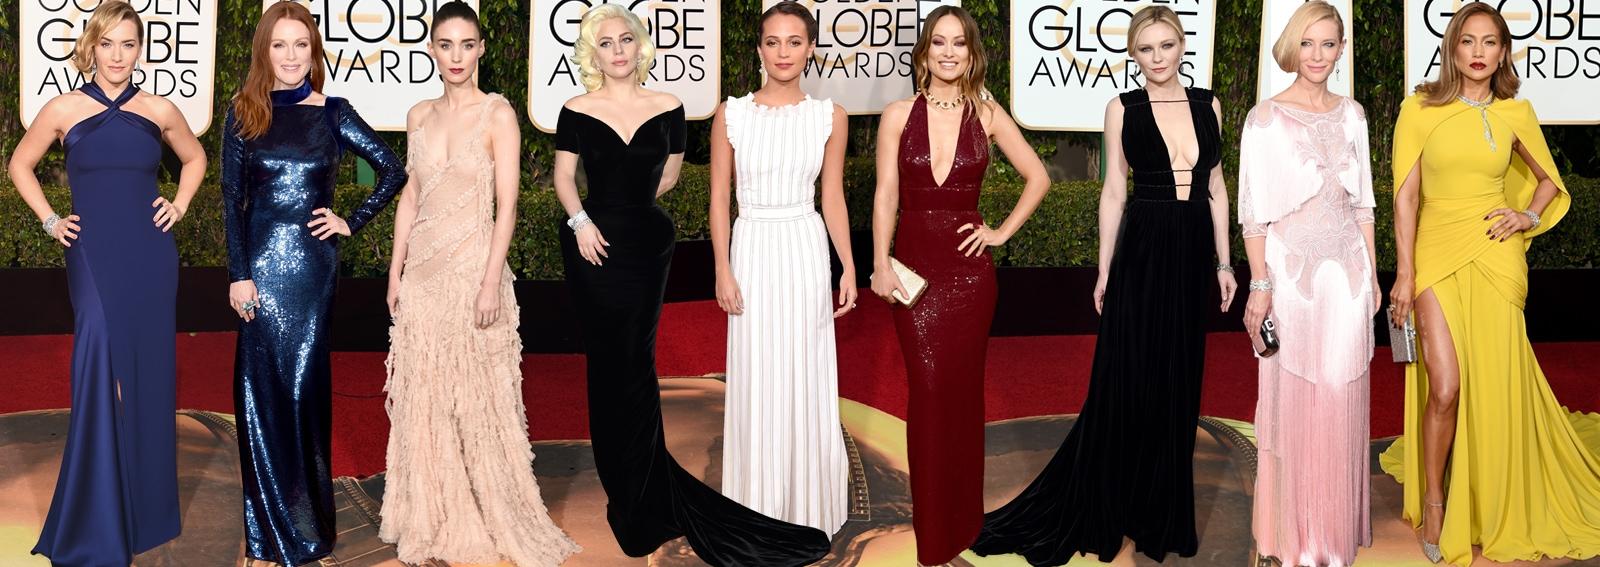 cover golden globes moda 2016 DESKTOP